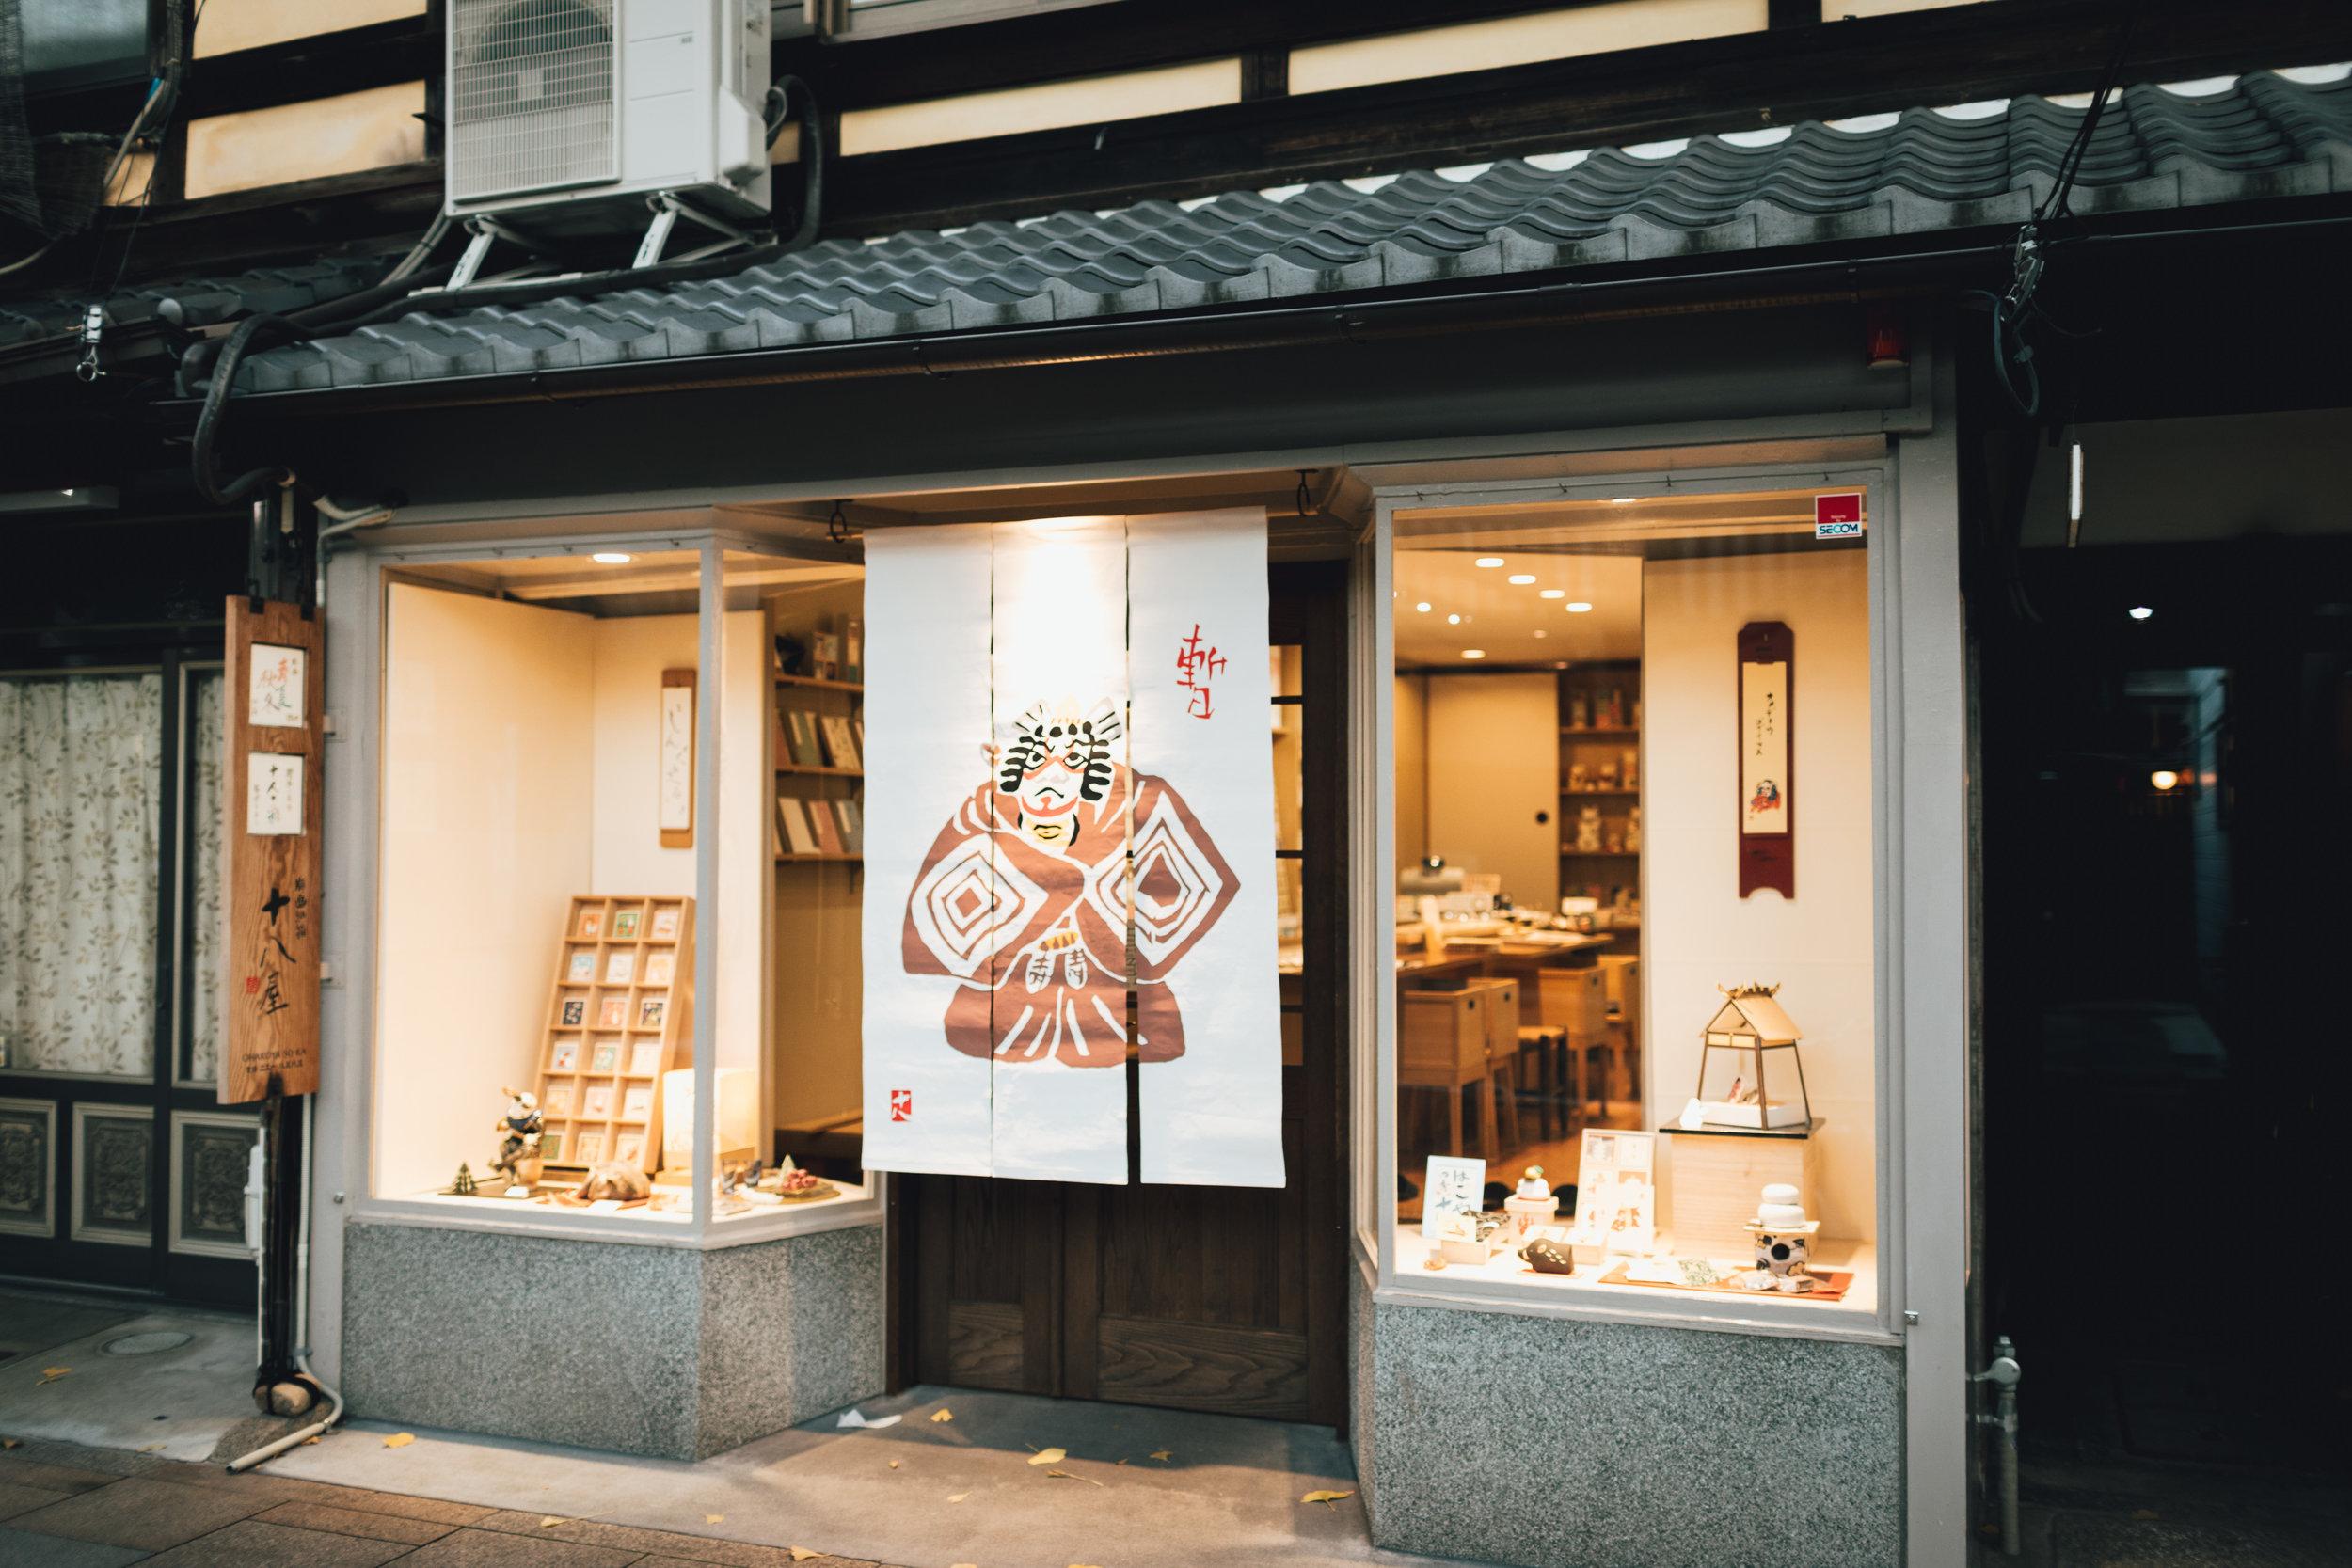 kyoto-photo-by-samantha-look.jpg